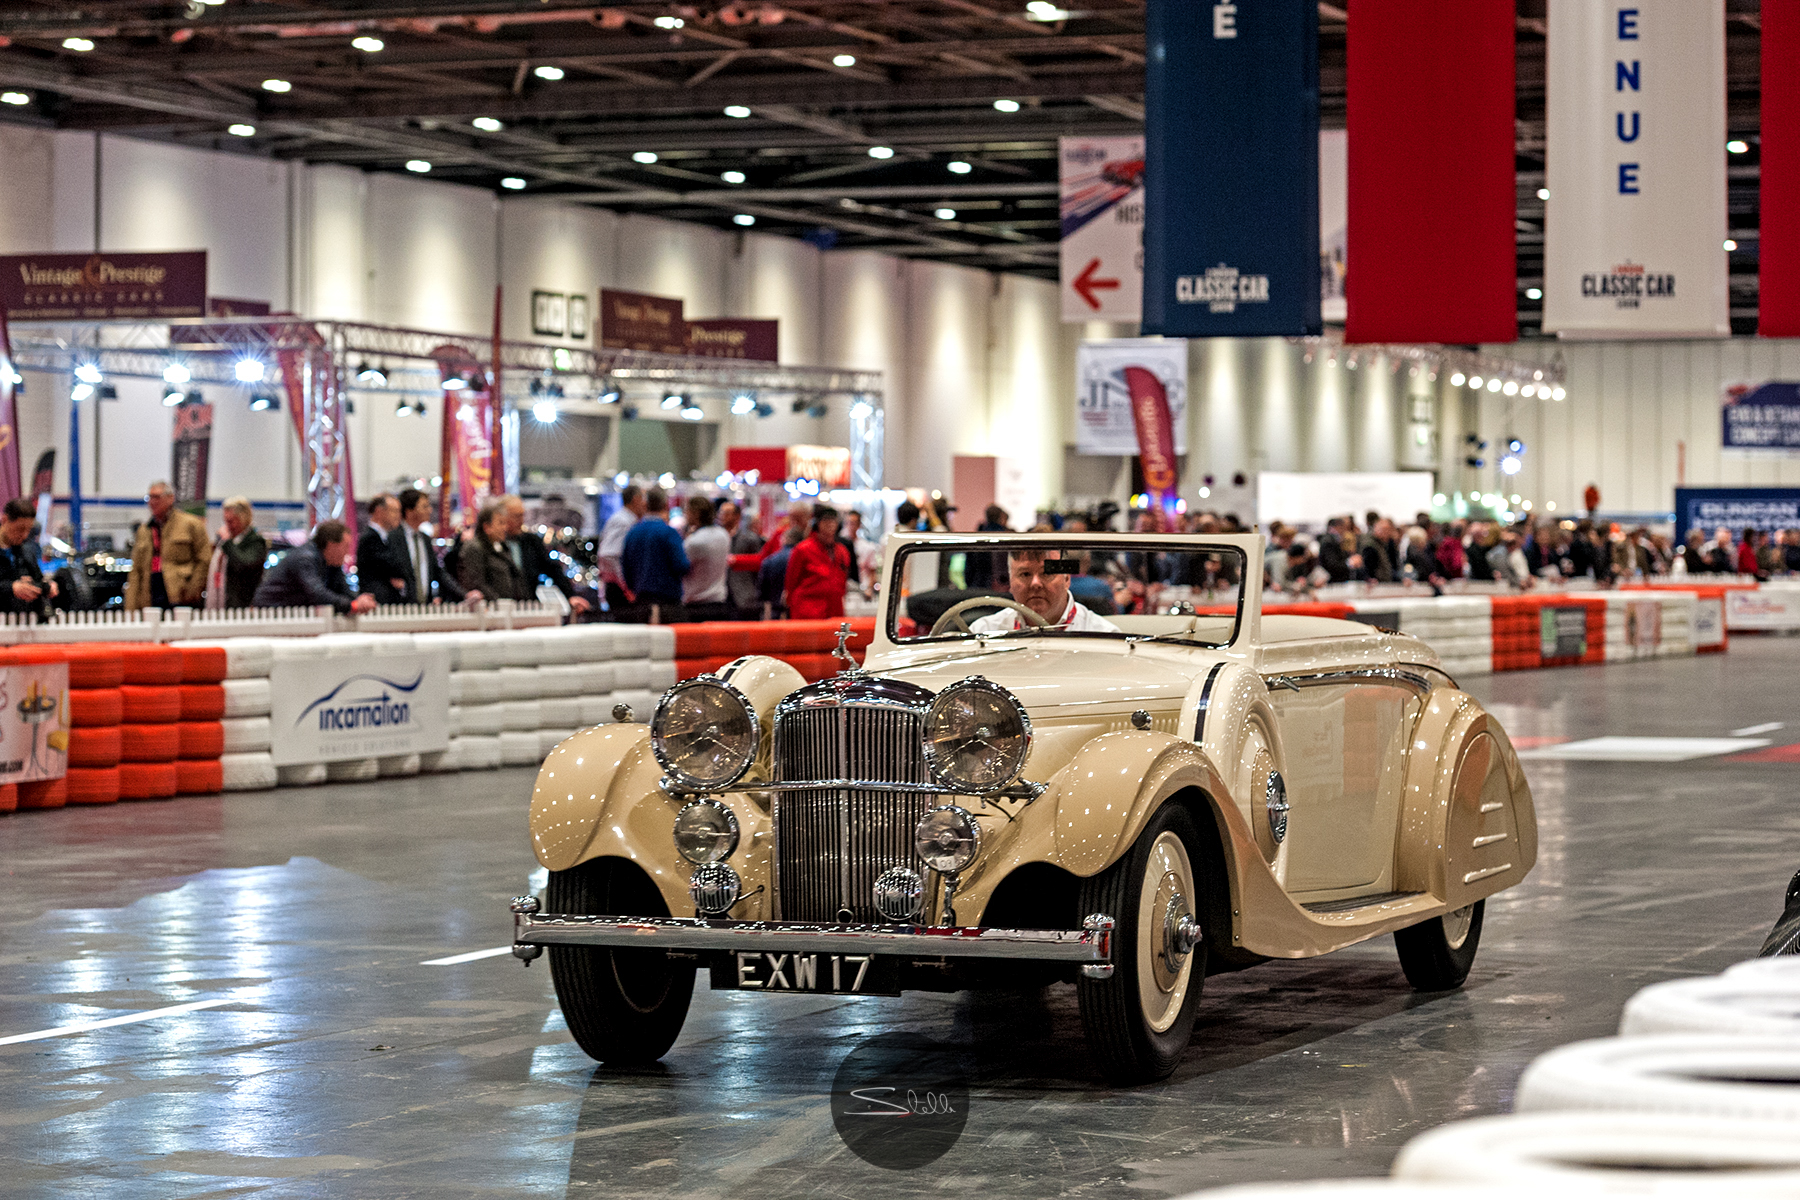 Stella Scordellis London Classic Car Show 2017 31 Watermarked.jpg